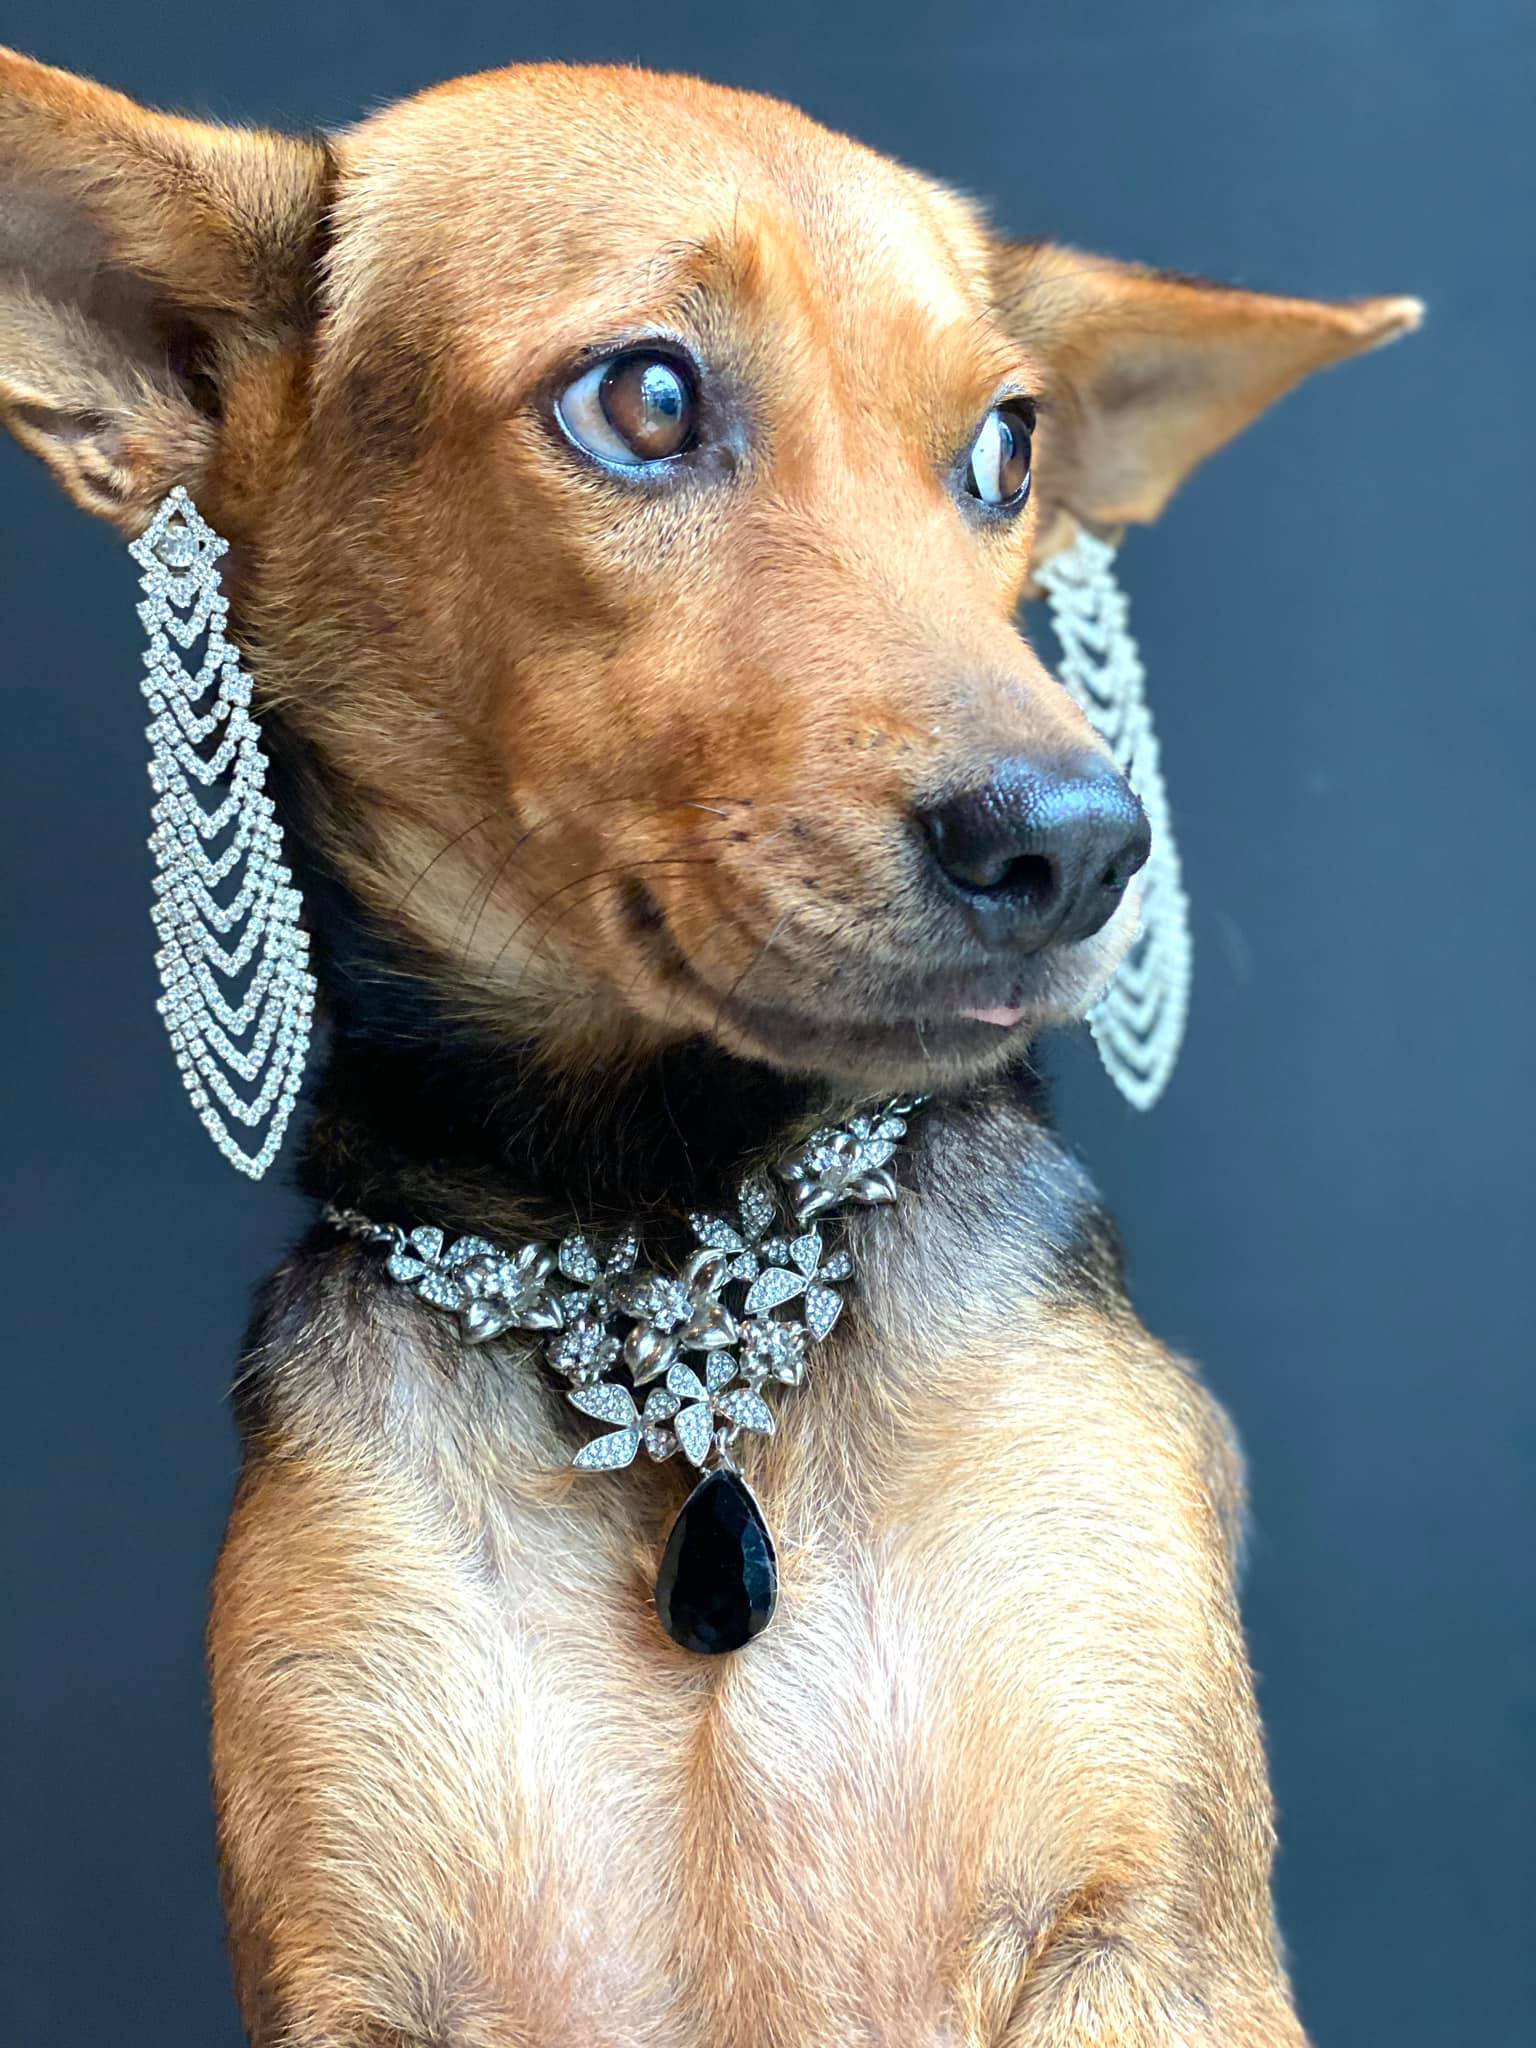 Dogilike.com :: อัปเดตชีวิตเจ้า หมูทะ หลังได้เจ้าของใหม่ ชีวิตสุดปัง